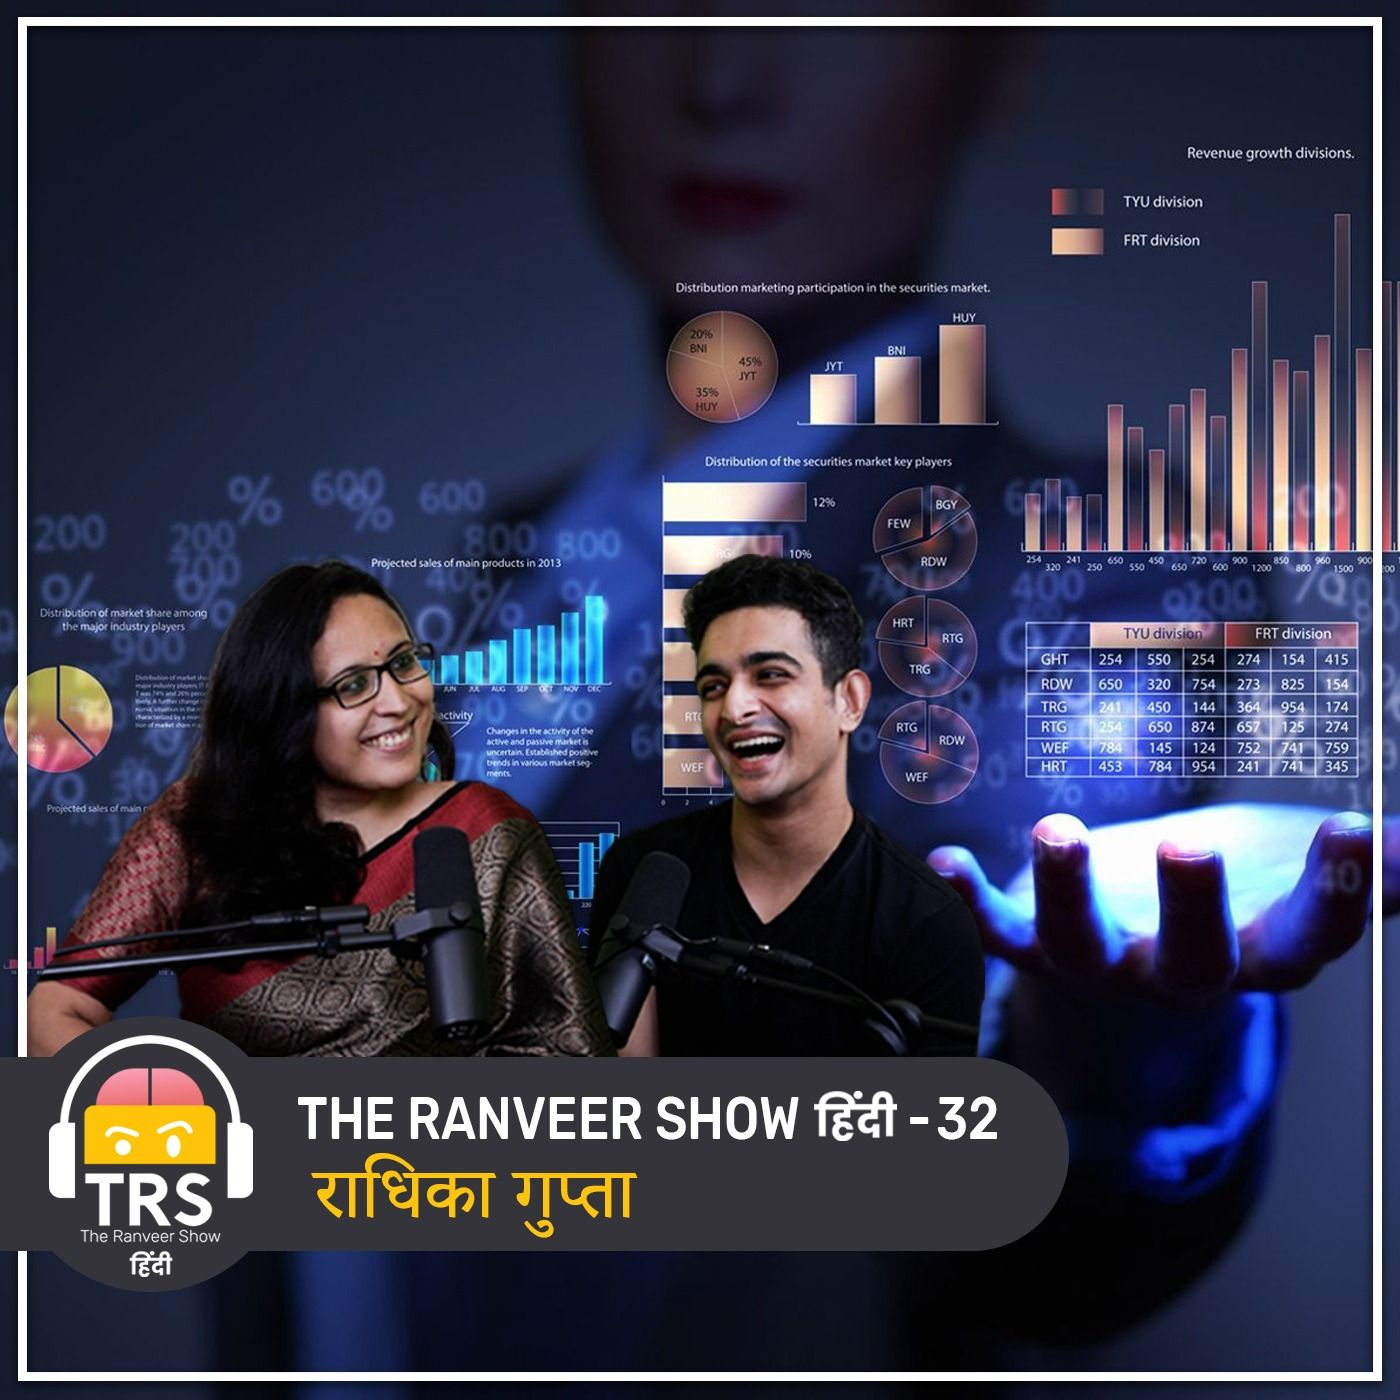 Best Personal Finance Strategies EASILY Explained ft. Radhika Gupta | The Ranveer Show हिंदी 32